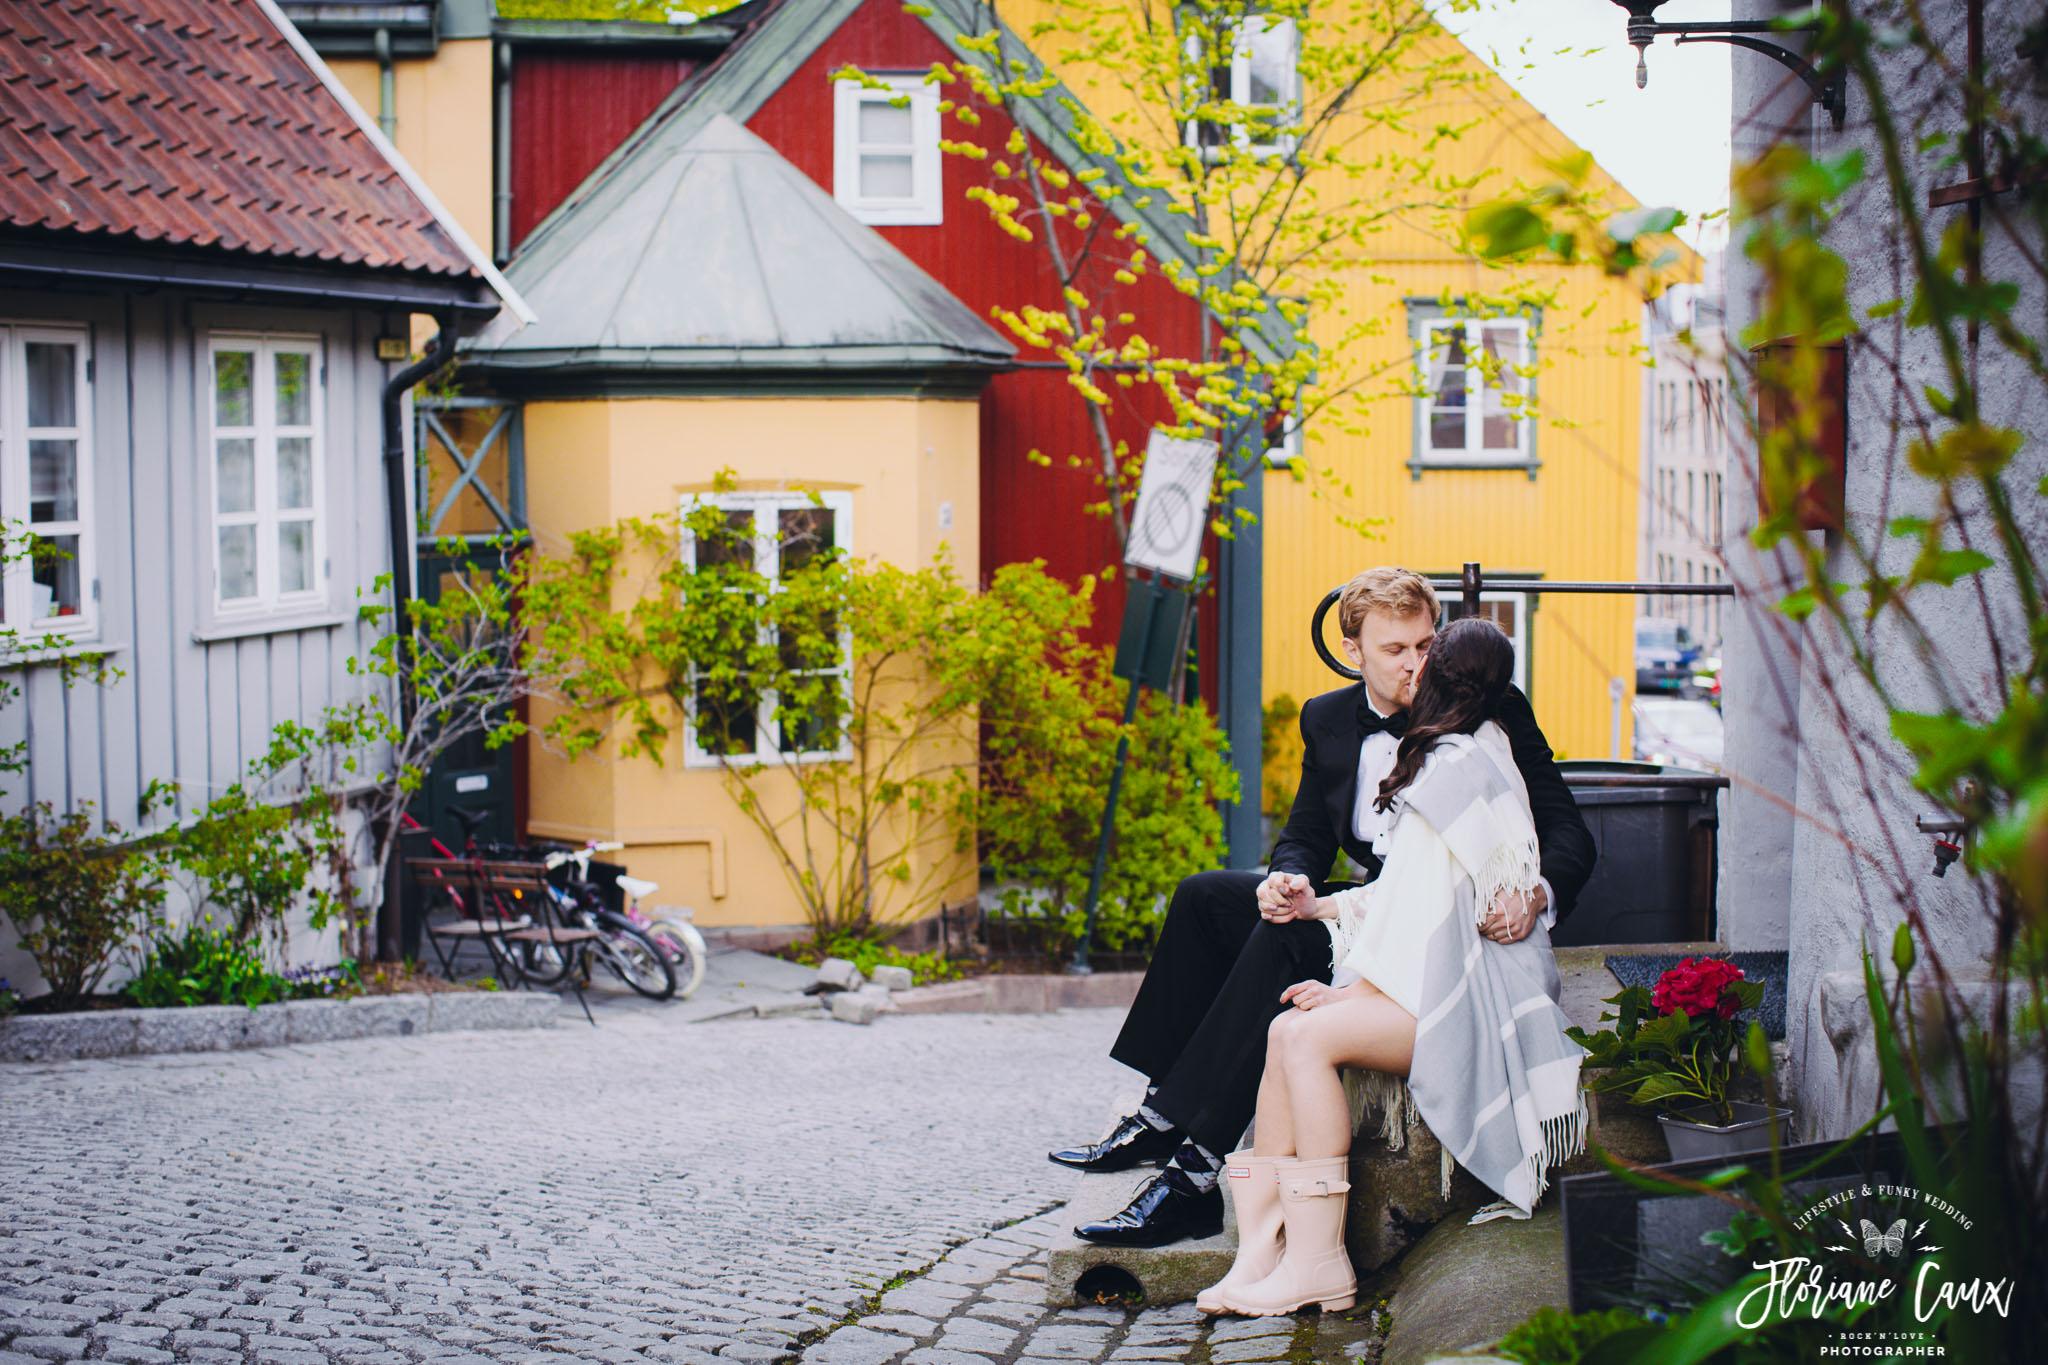 destination-wedding-photographer-oslo-norway-floriane-caux-23